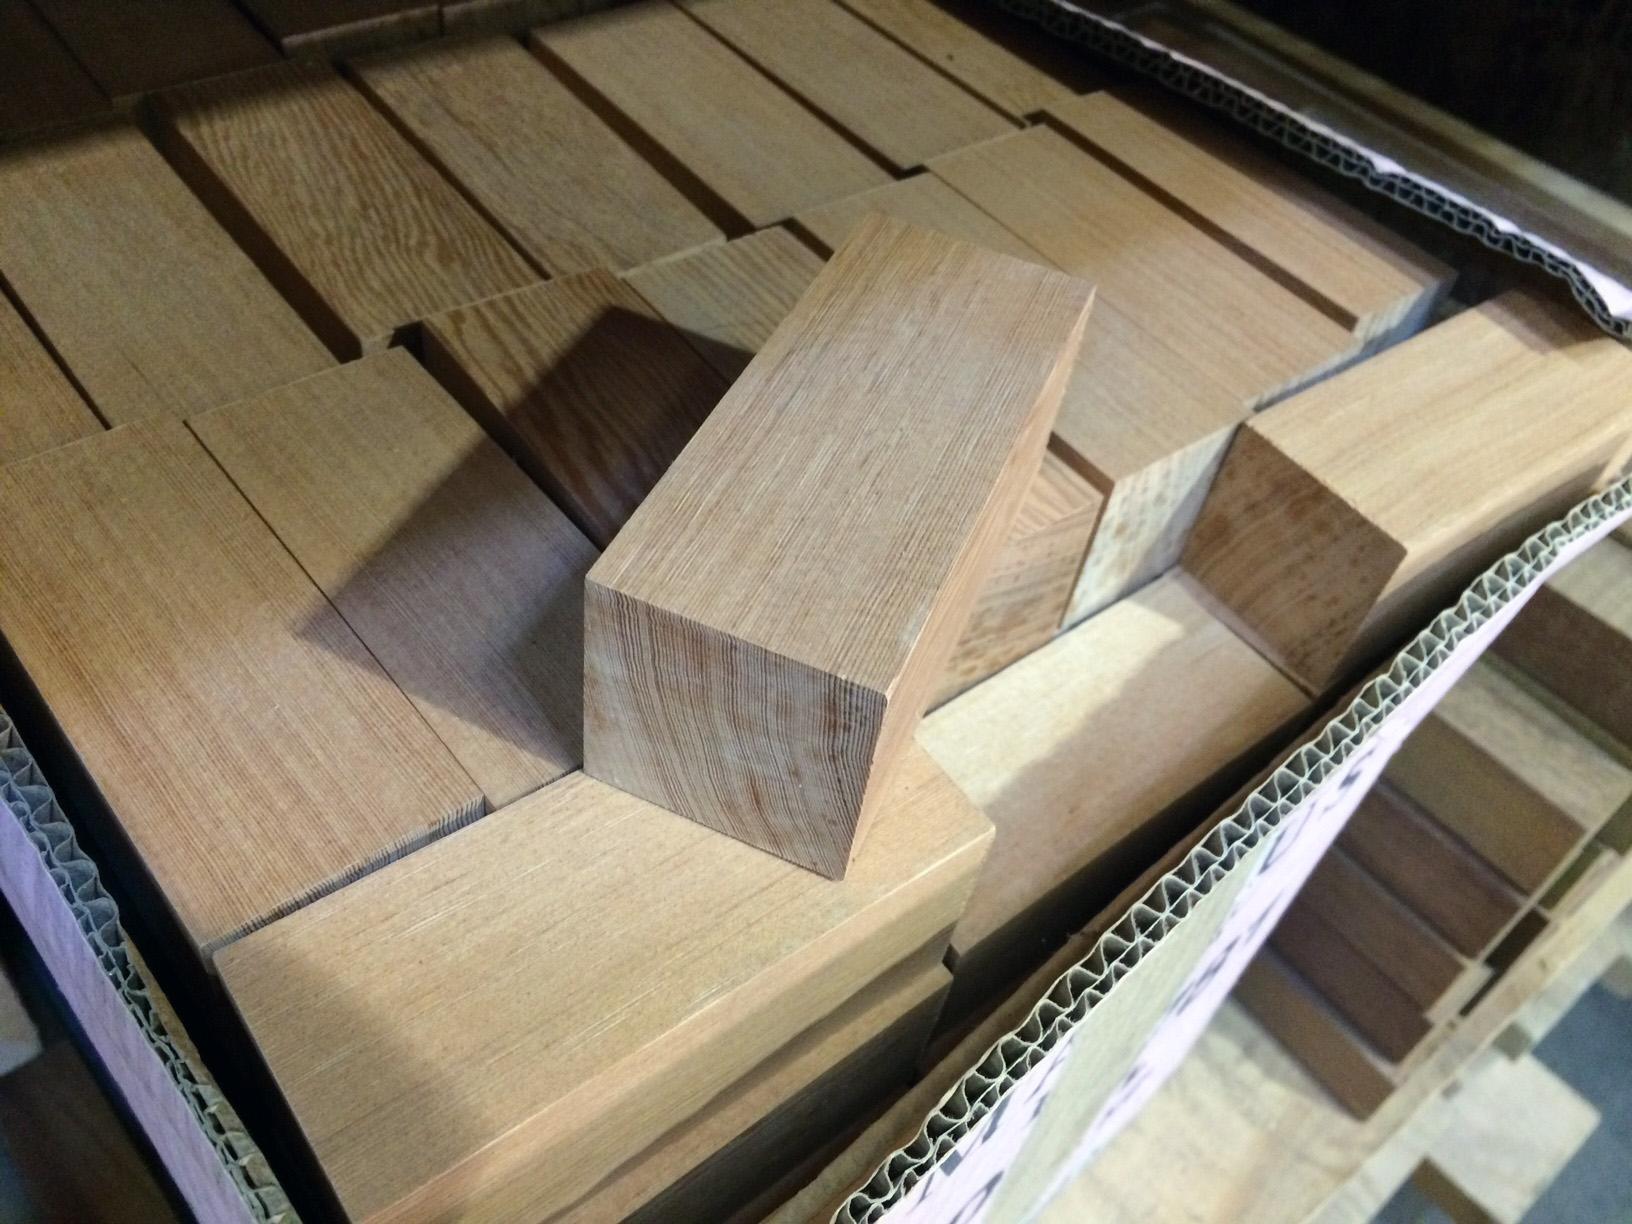 Douglas fir blocks hobby carving west wind hardwood